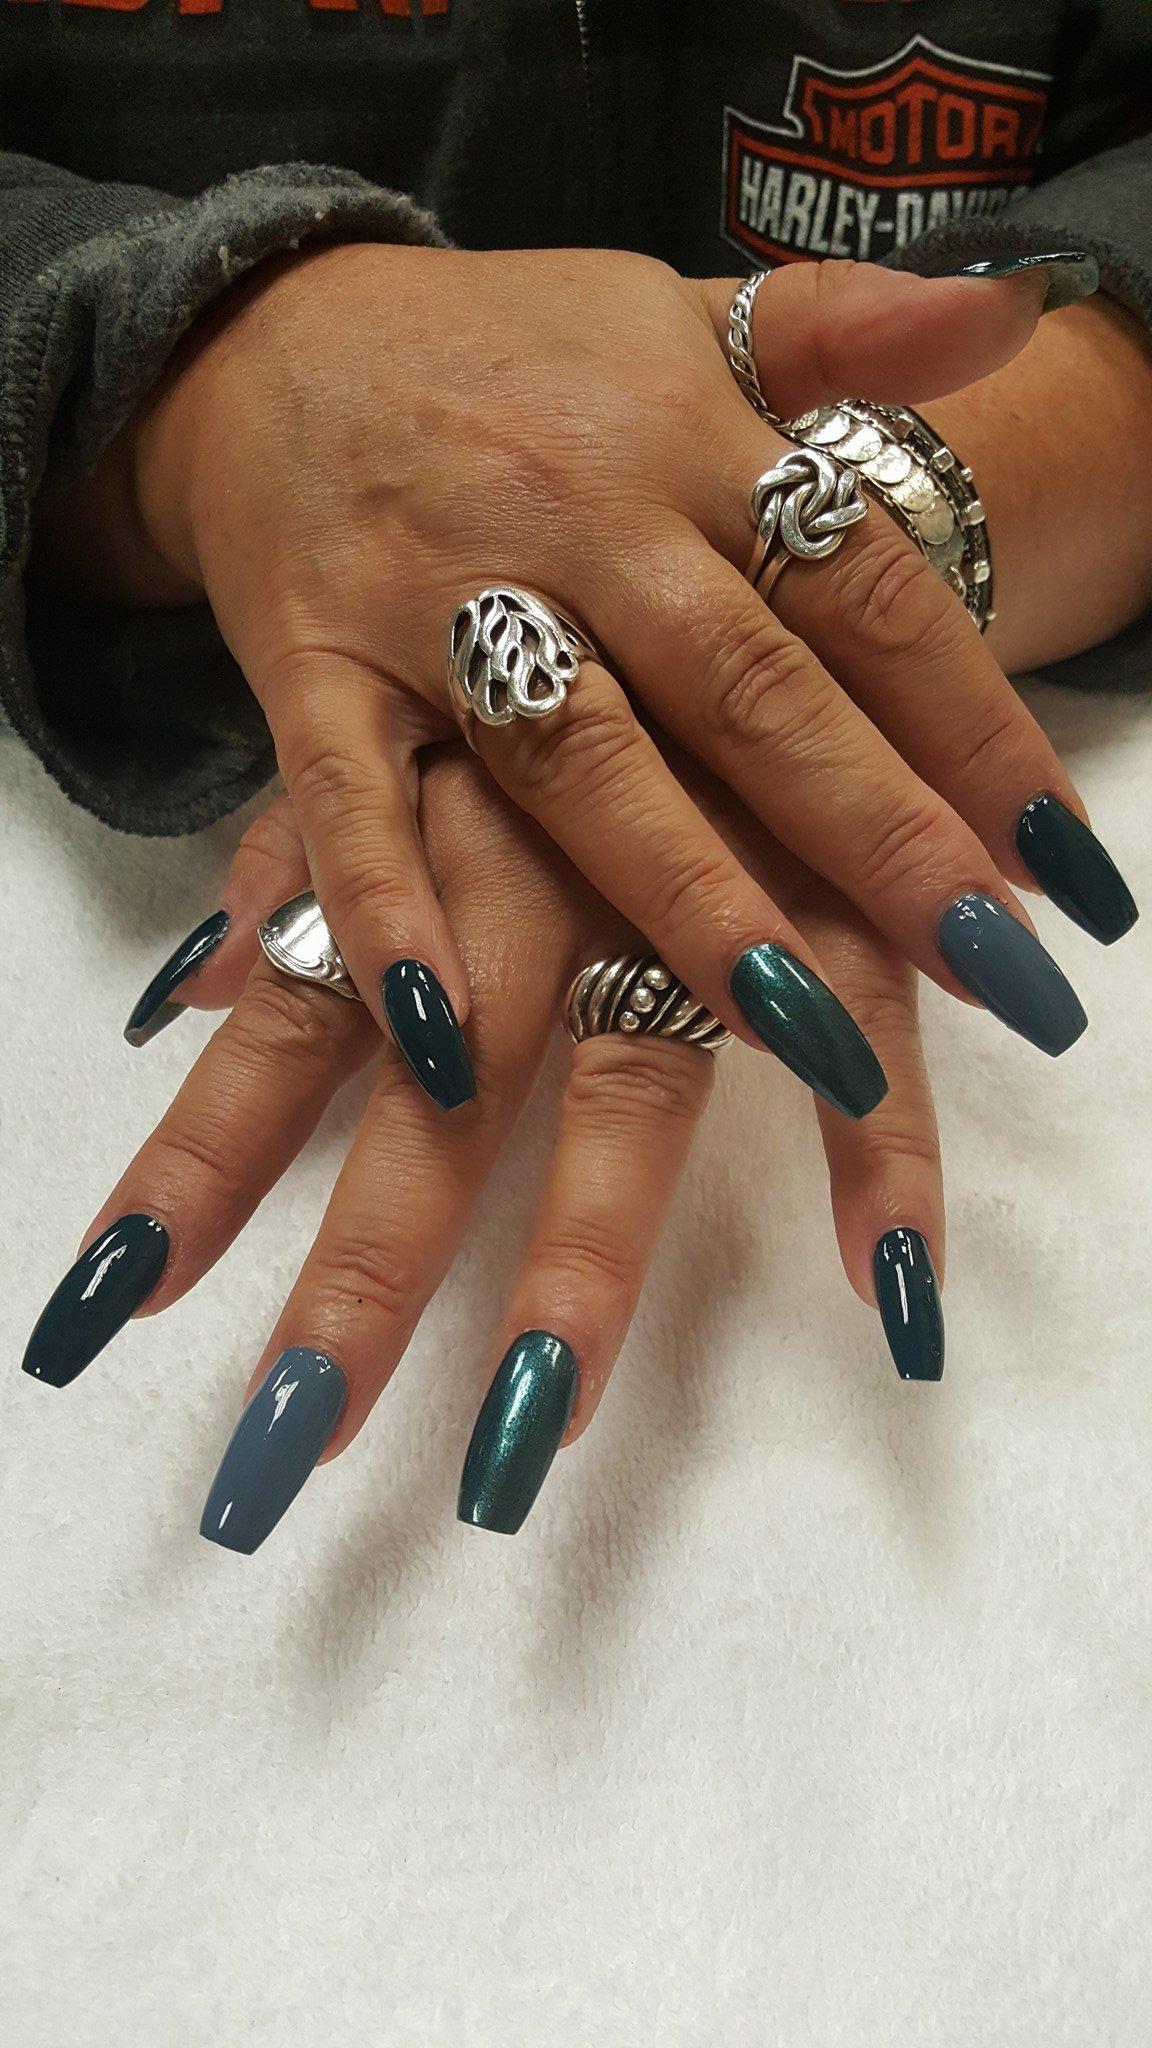 Diamond Nails Spa Tanning